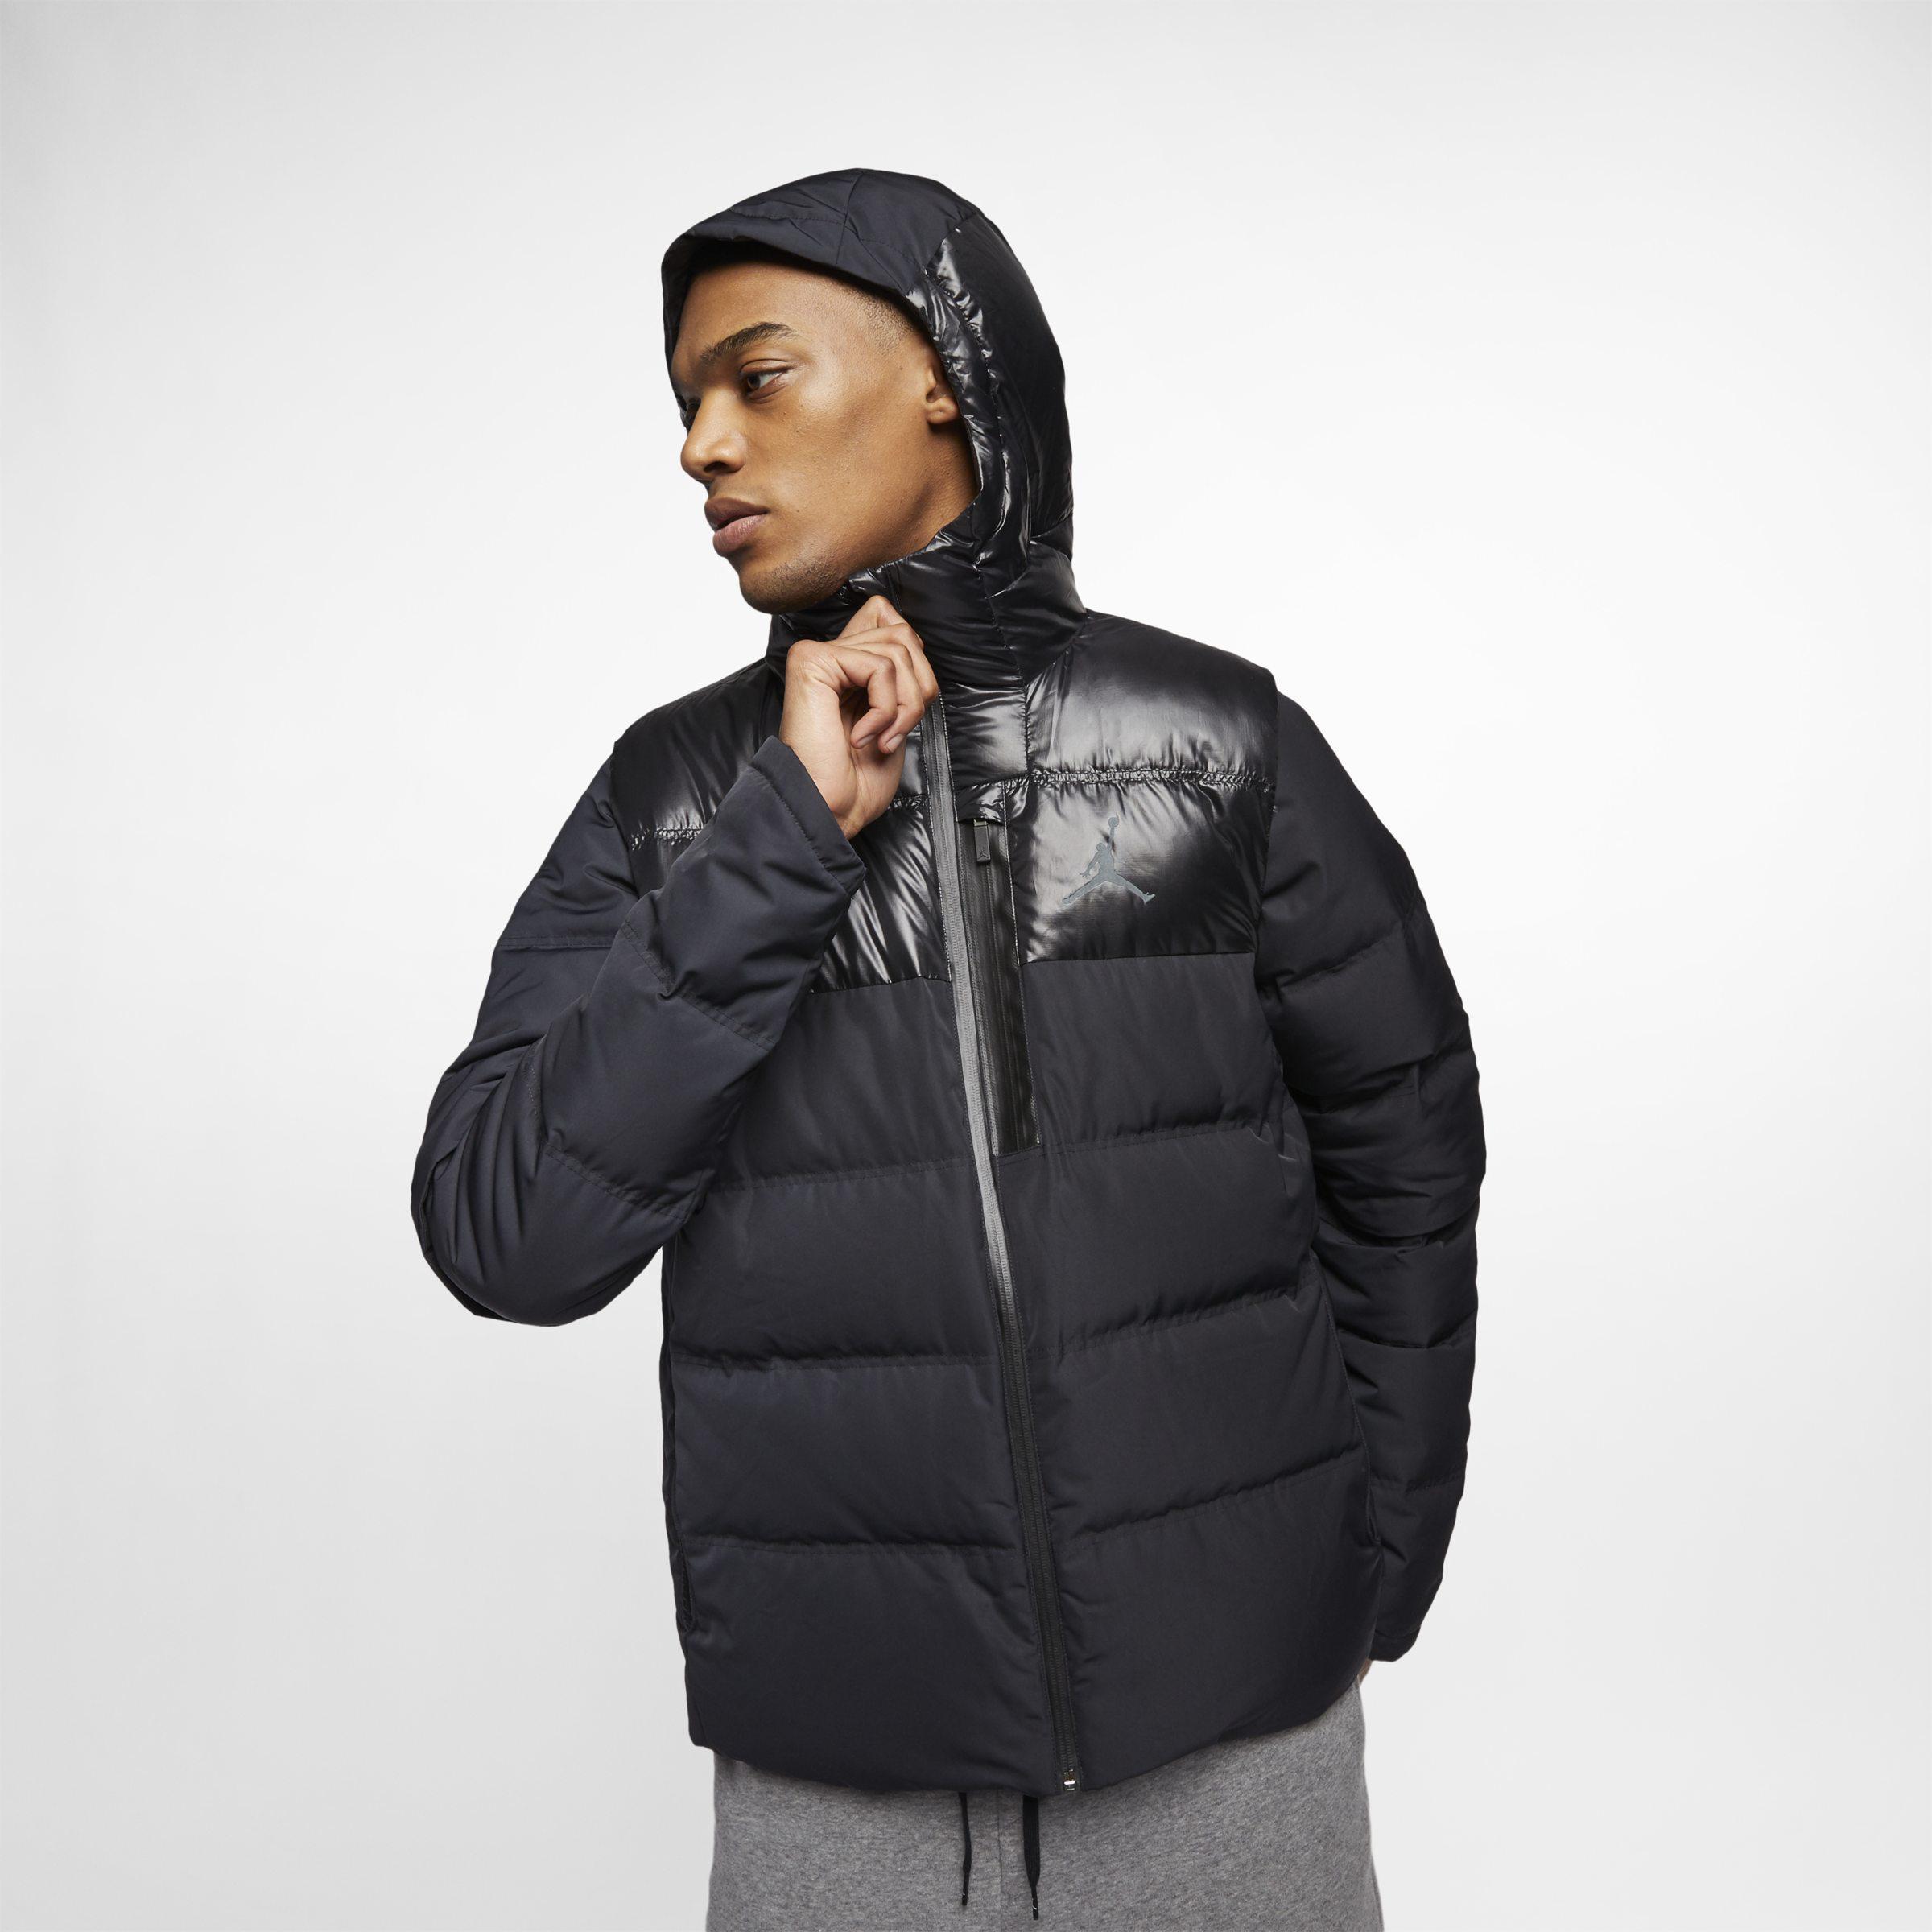 0a0b5d5b318b Nike Jordan Ultimate Flight Down-fill Jacket in Black for Men - Lyst